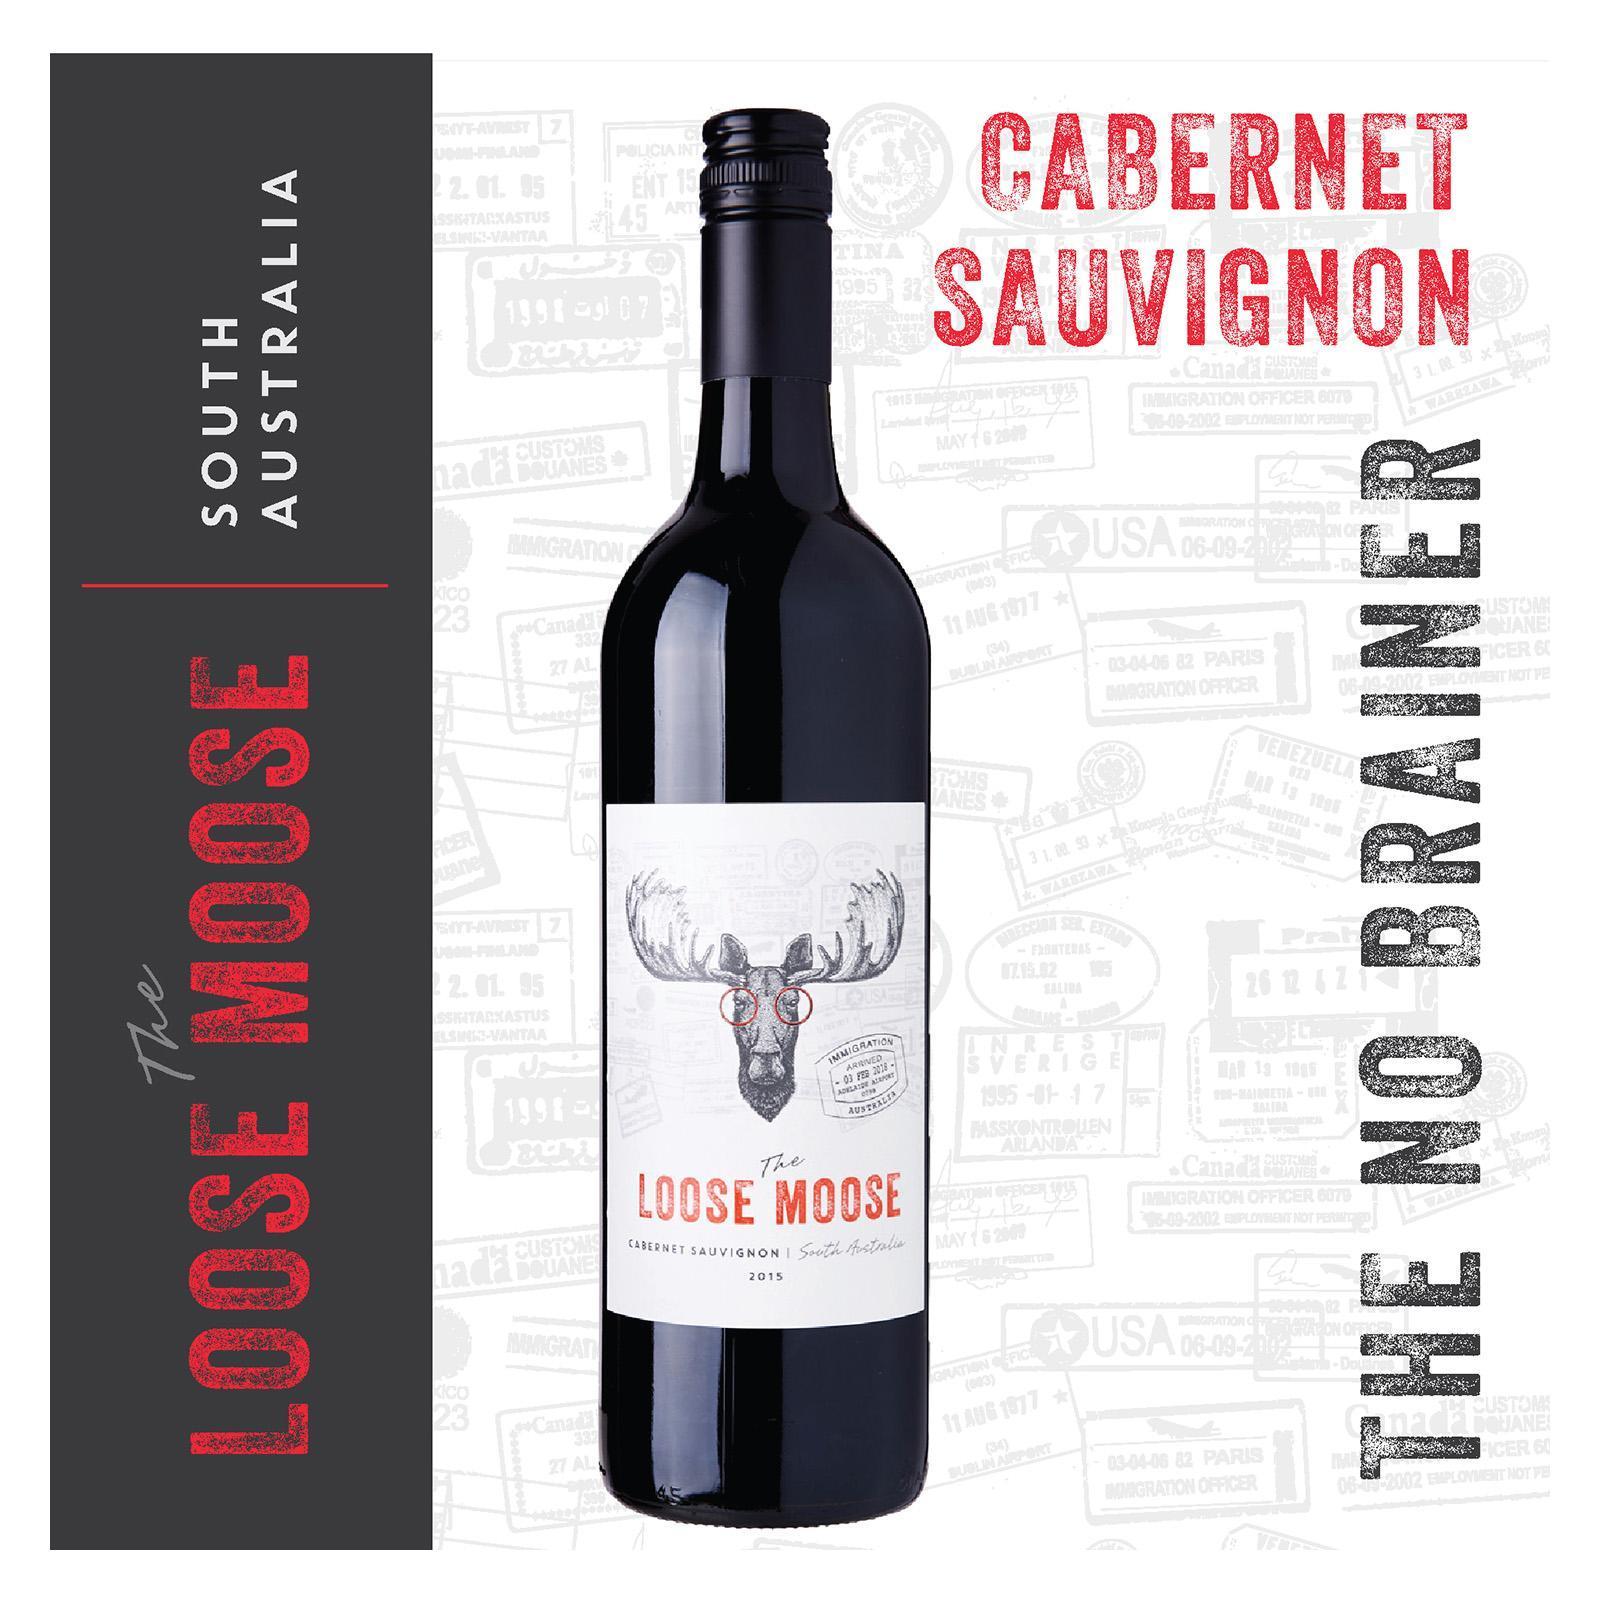 The Loose Moose South Australia Cabernet Sauvignon Red Wine